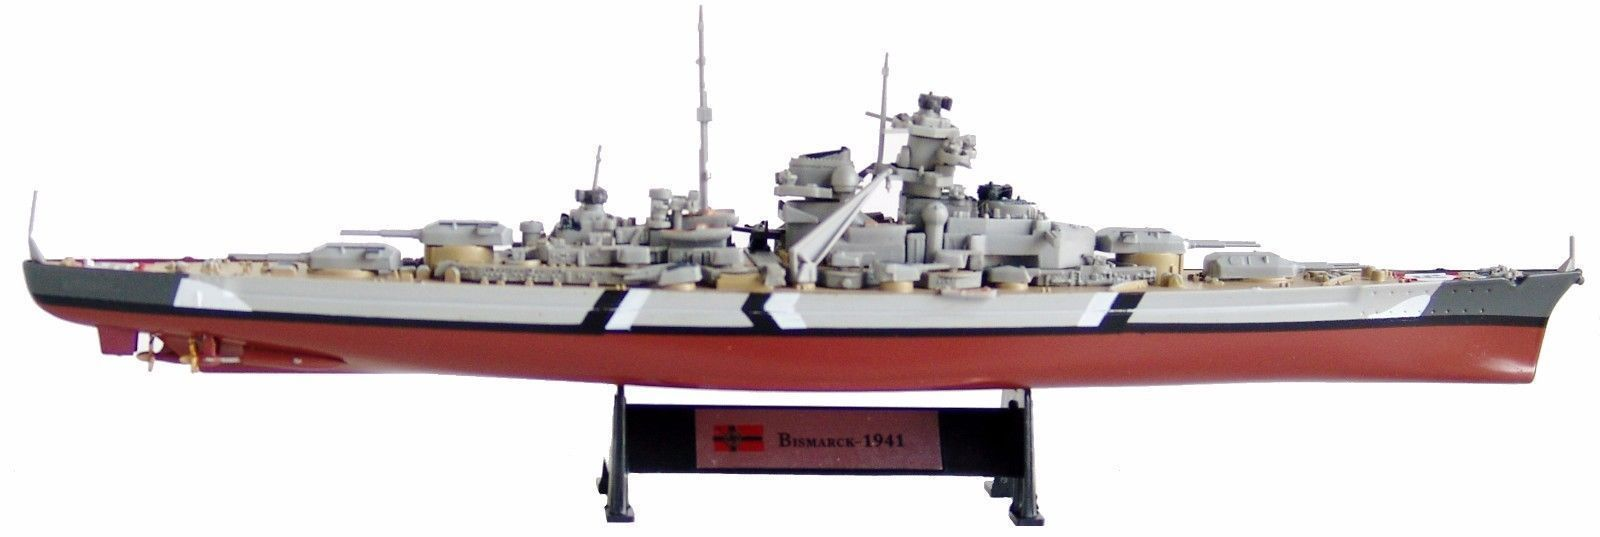 Bismarck 1941-1/1000 Warship of World War II Collection **US Seller**